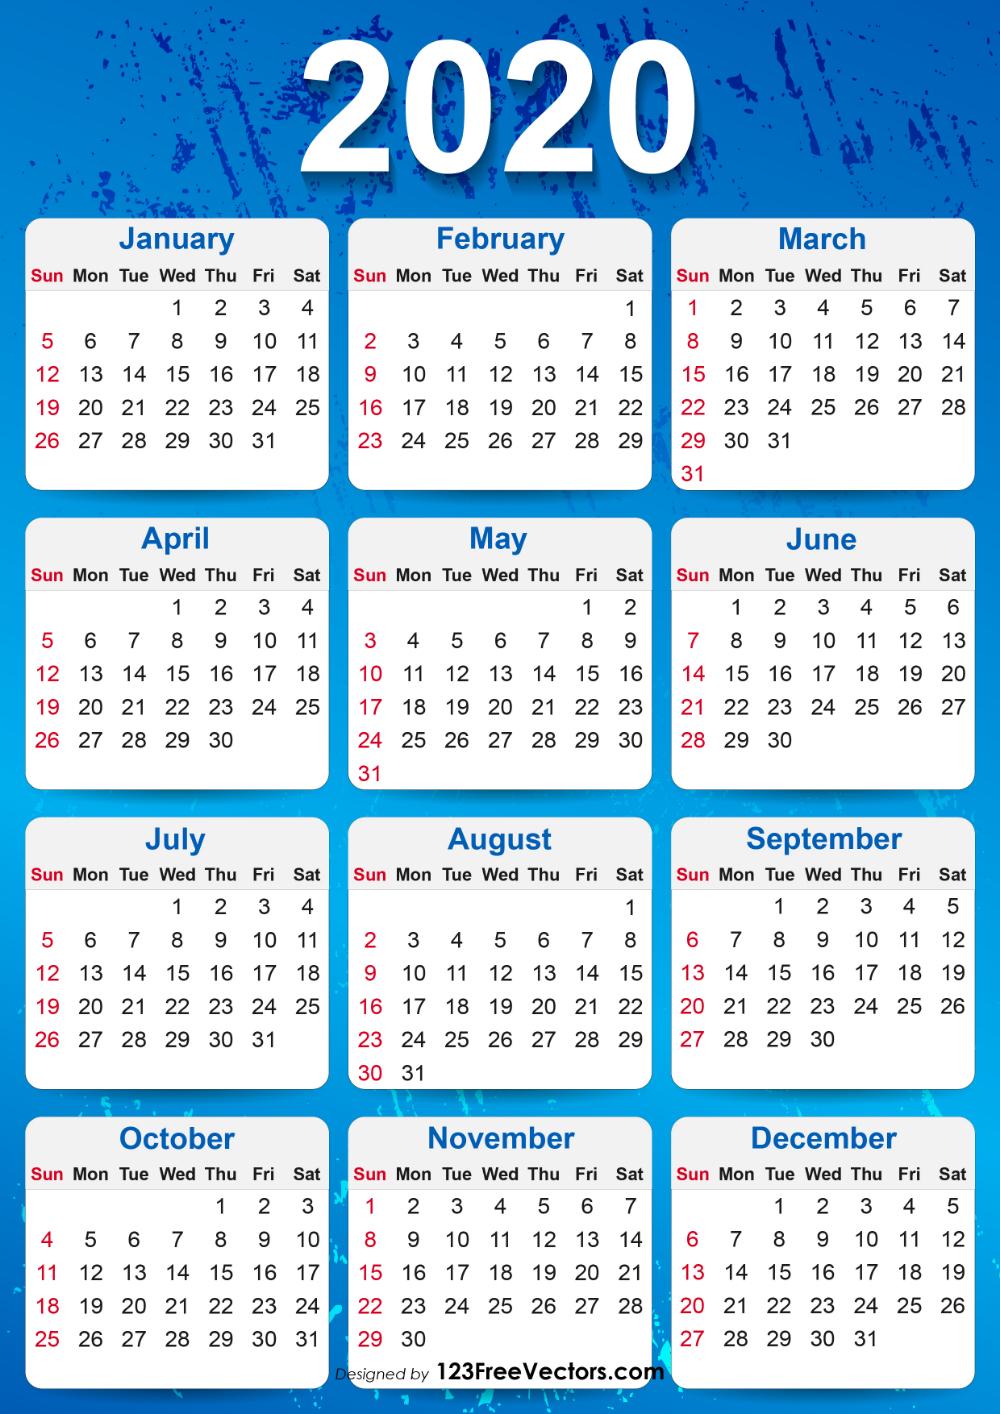 From Igdrus Gallery, Pinterest2020Yearlycalendar intended for December Calendar 2020 Pinterest